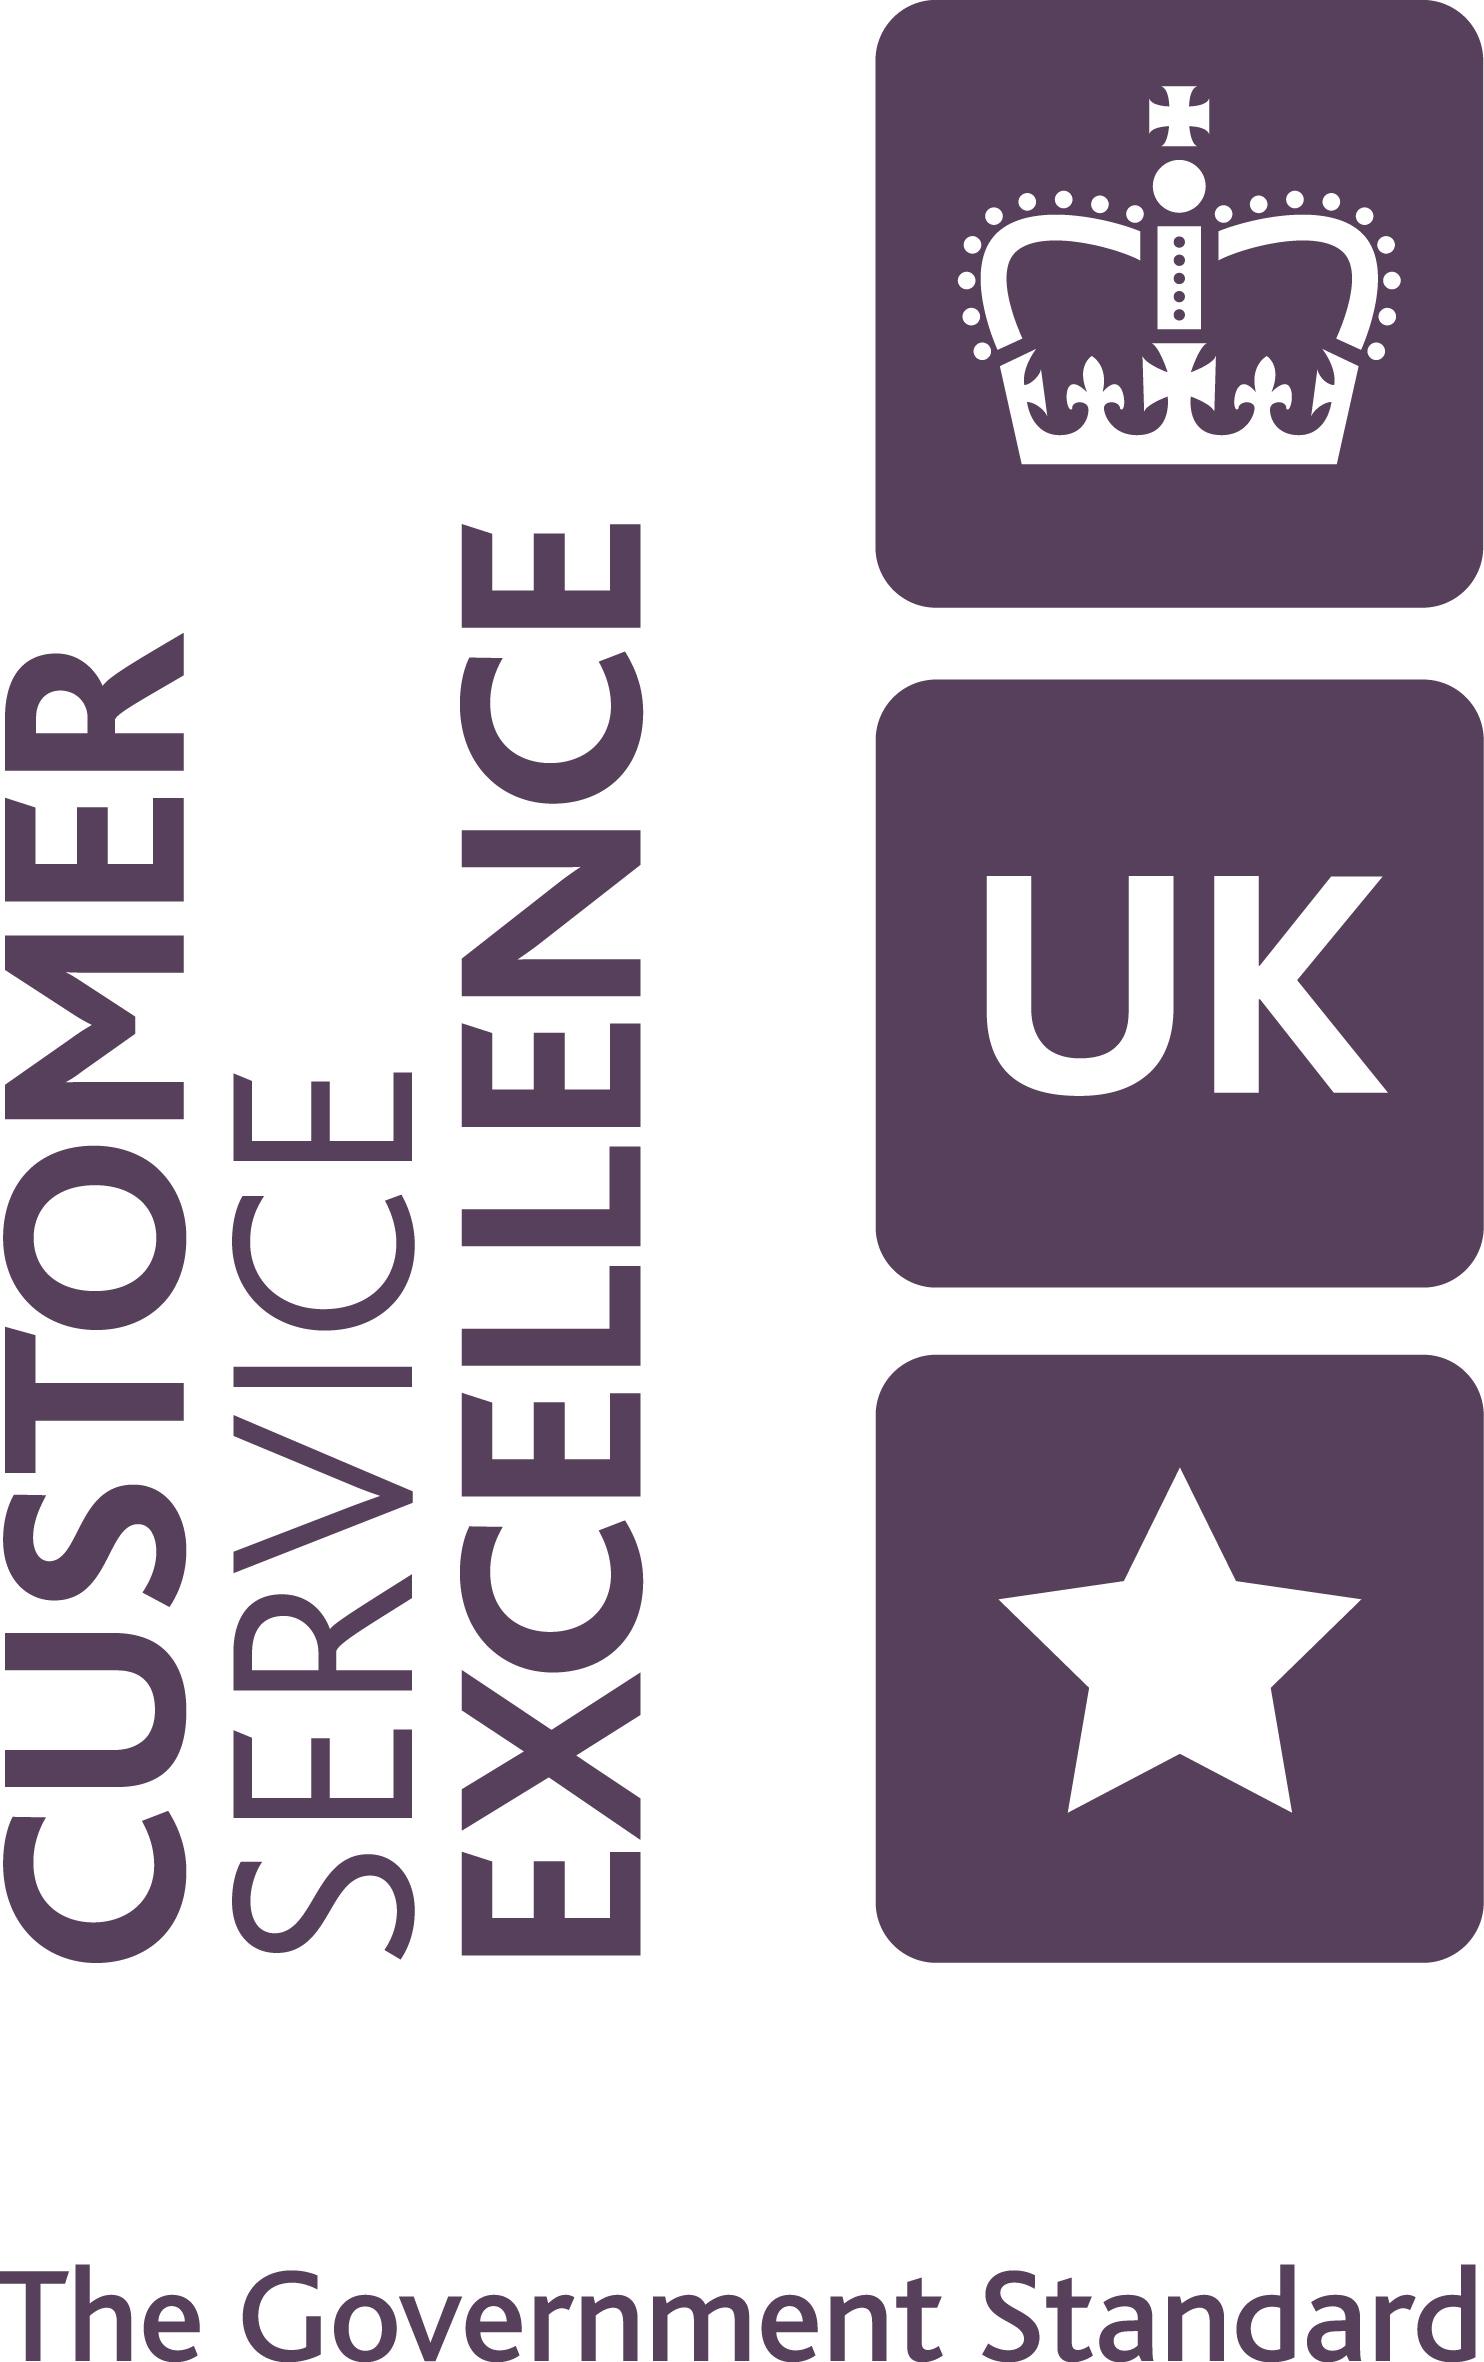 News habinteg housing association habinteg attains excellence in customer services award publicscrutiny Choice Image